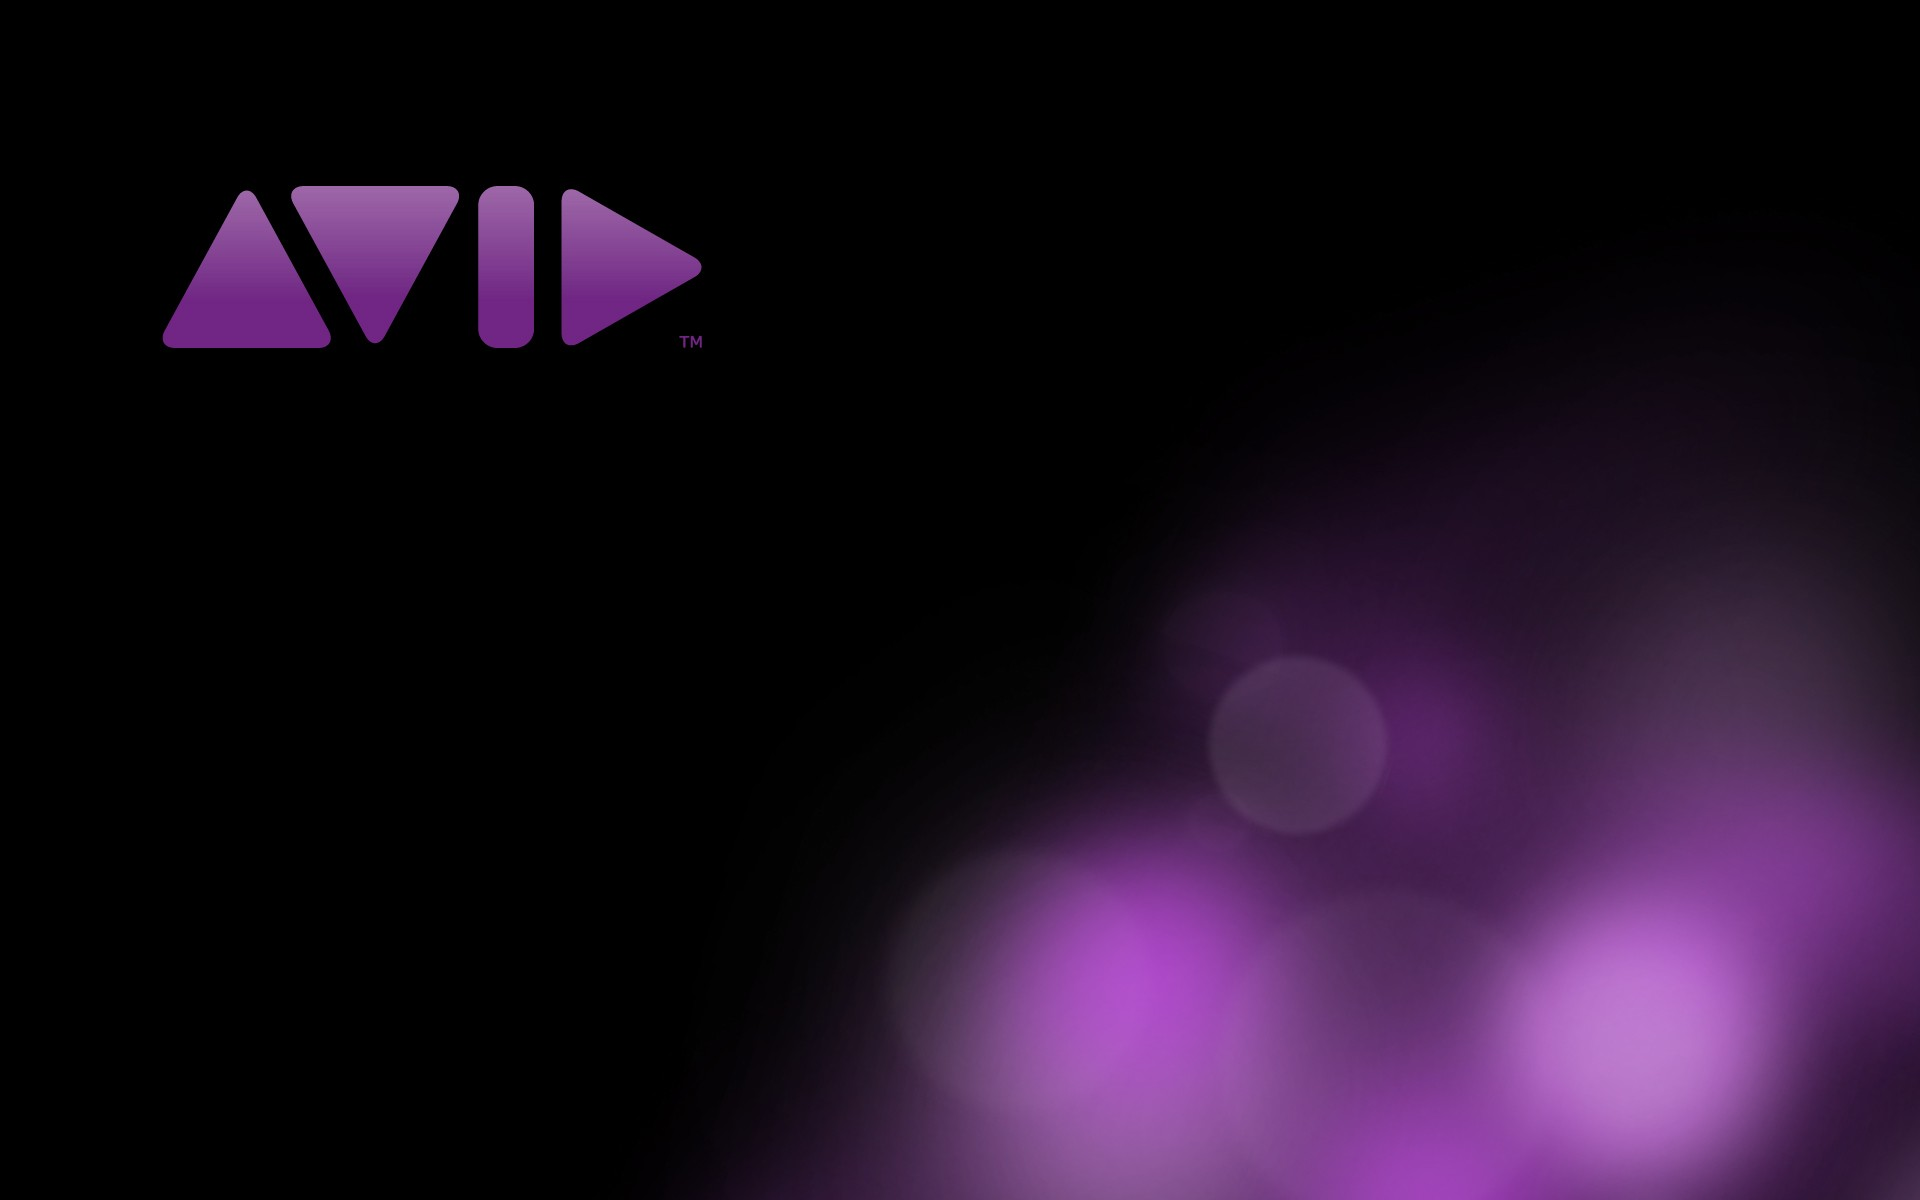 General 1920x1200 logo Avid Technology shapes minimalism purple simple background black background